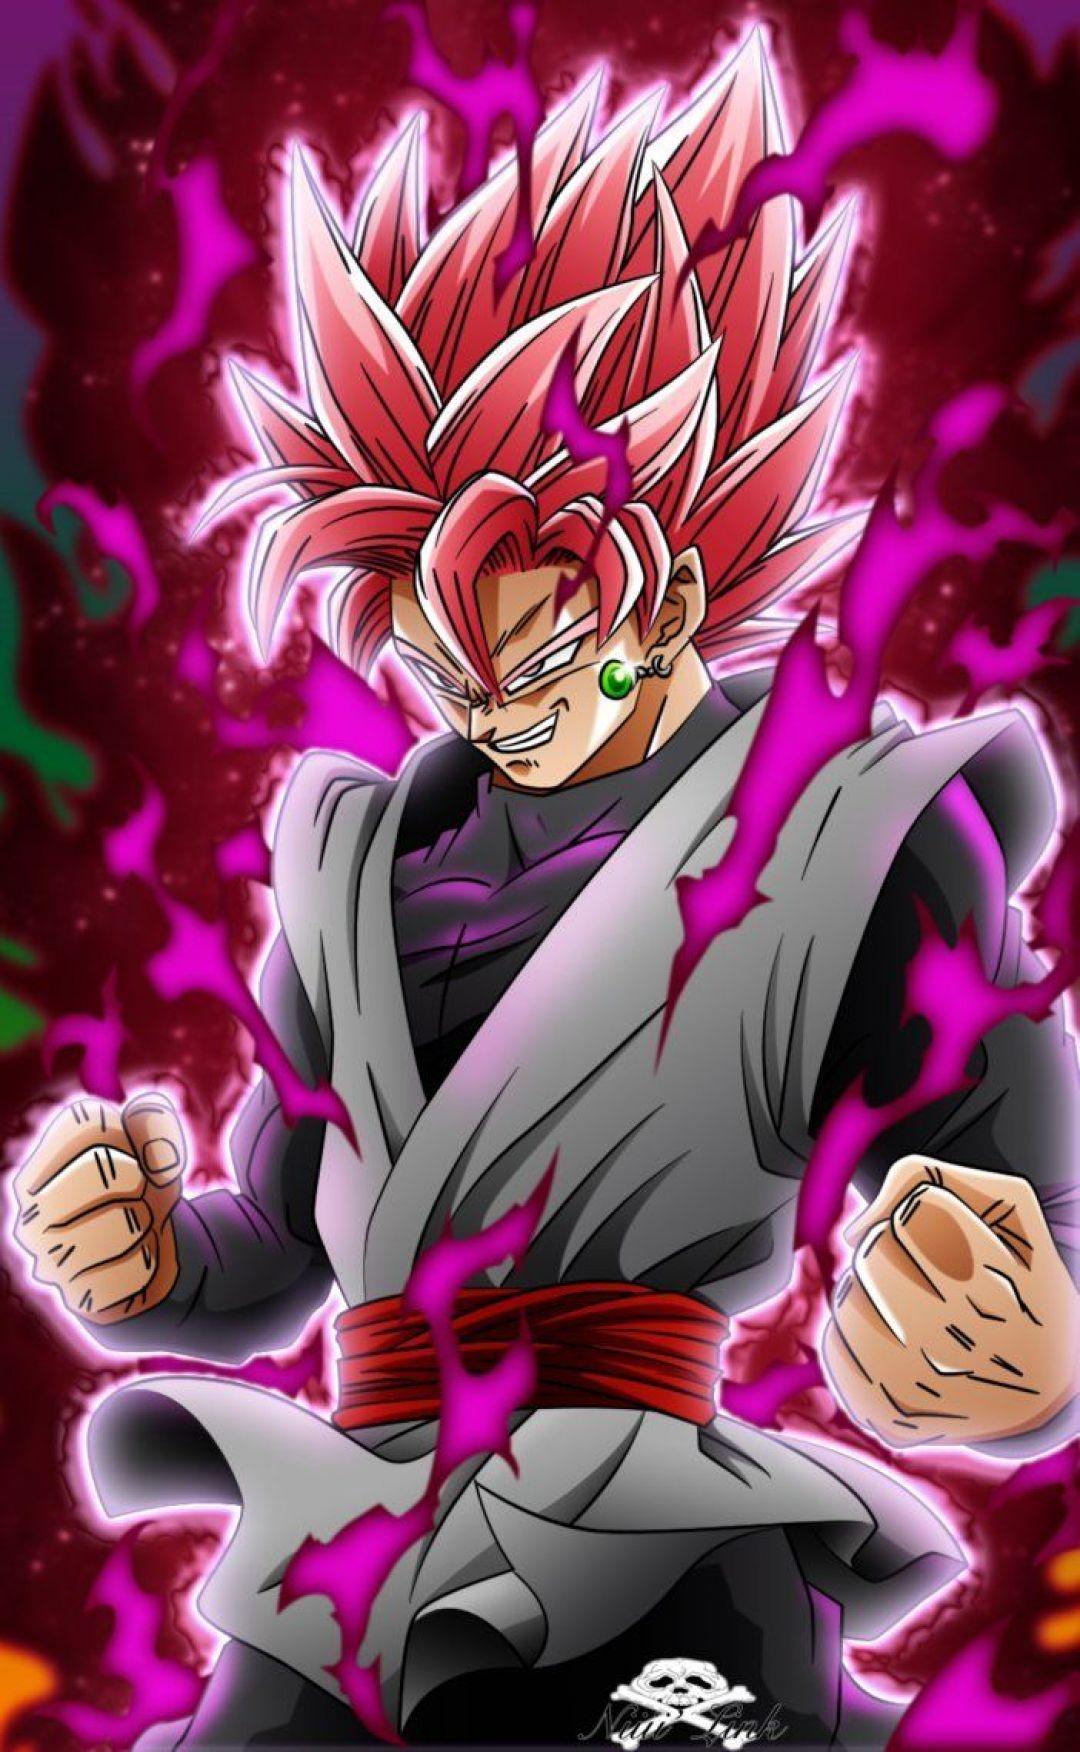 Android Iphone Desktop Hd Backgrounds Wallpapers Black Goku Ssj Rose Manga 1080x1752 Download Hd Wallpaper Wallpapertip